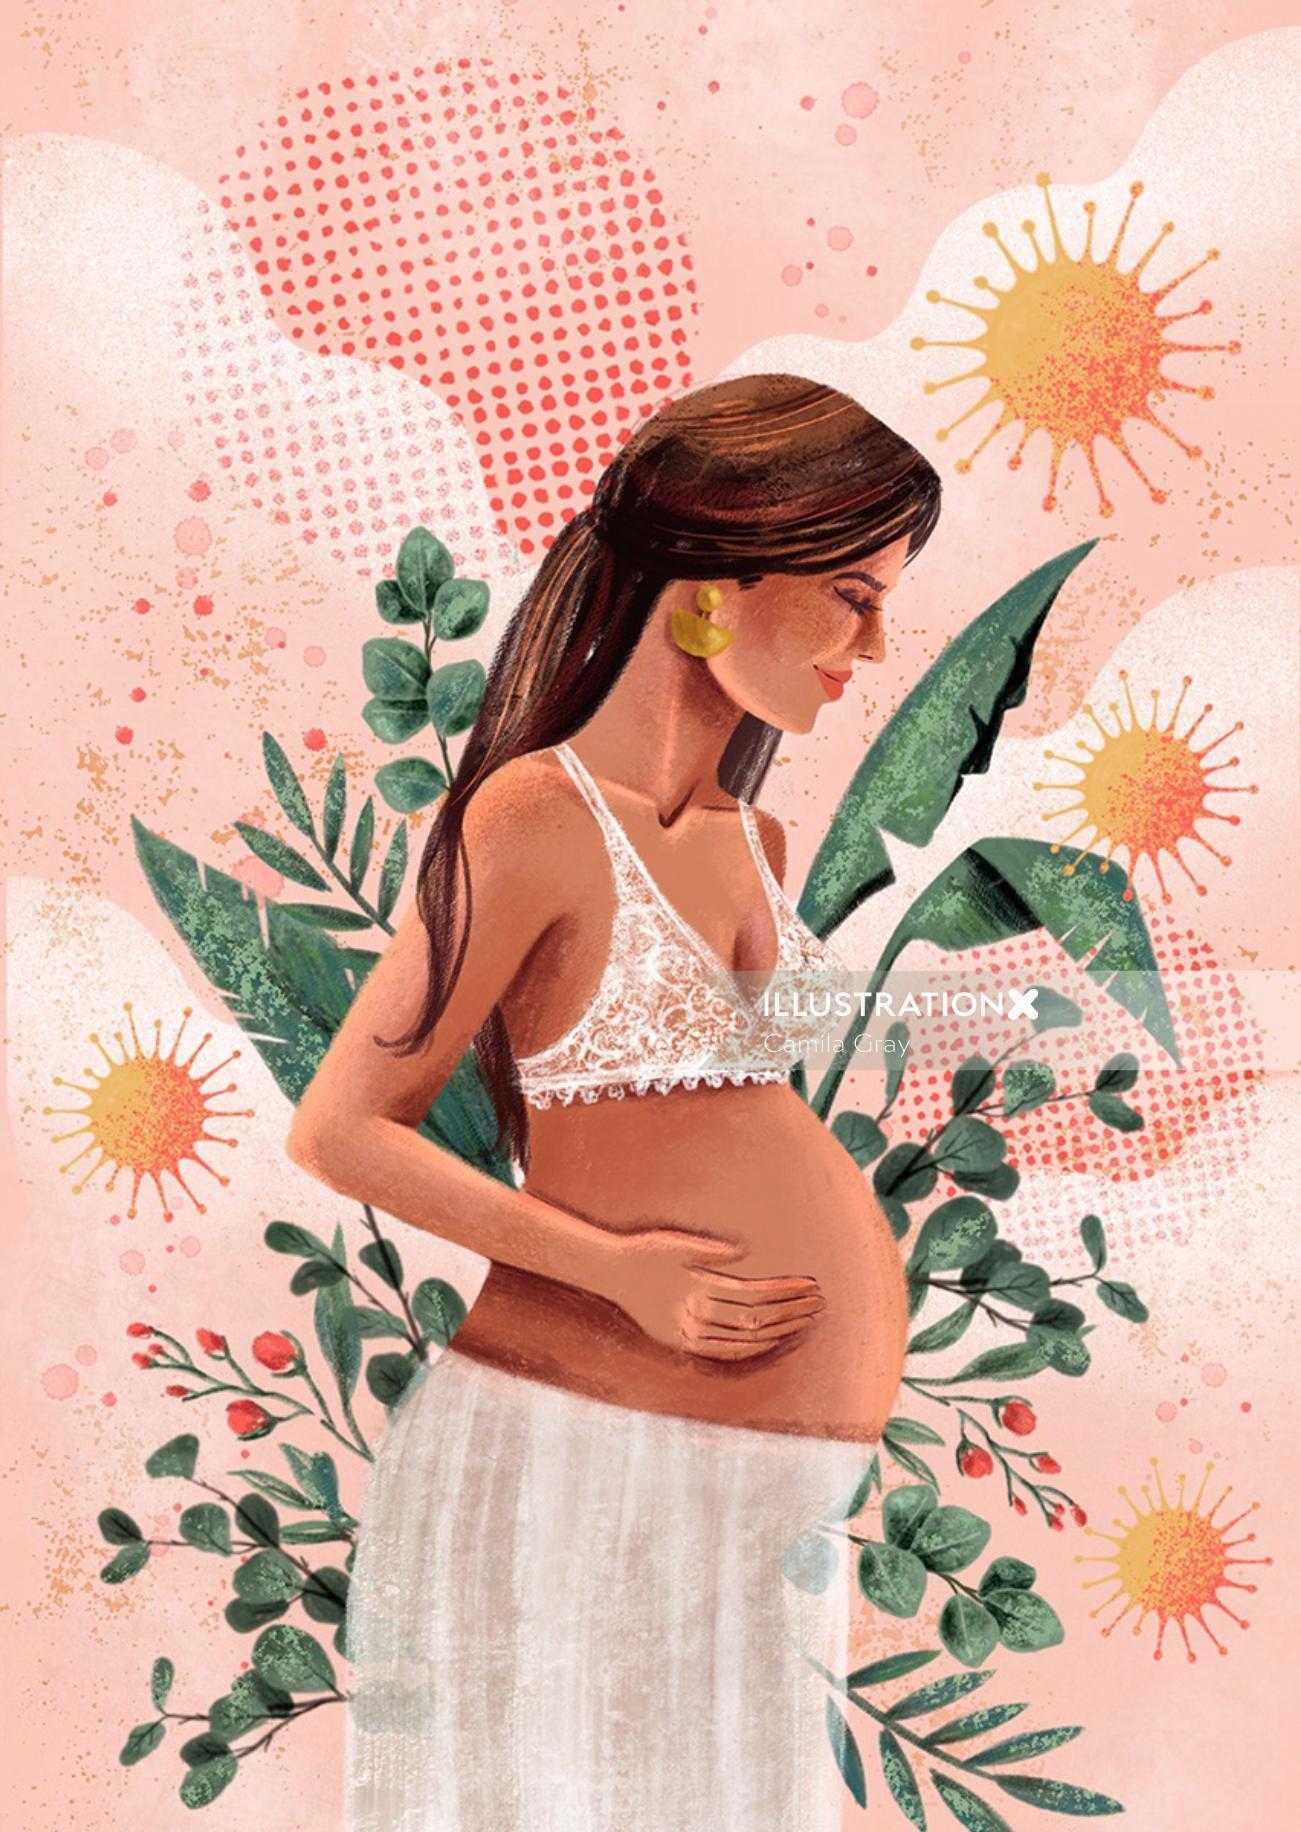 Pregnant woman illustration